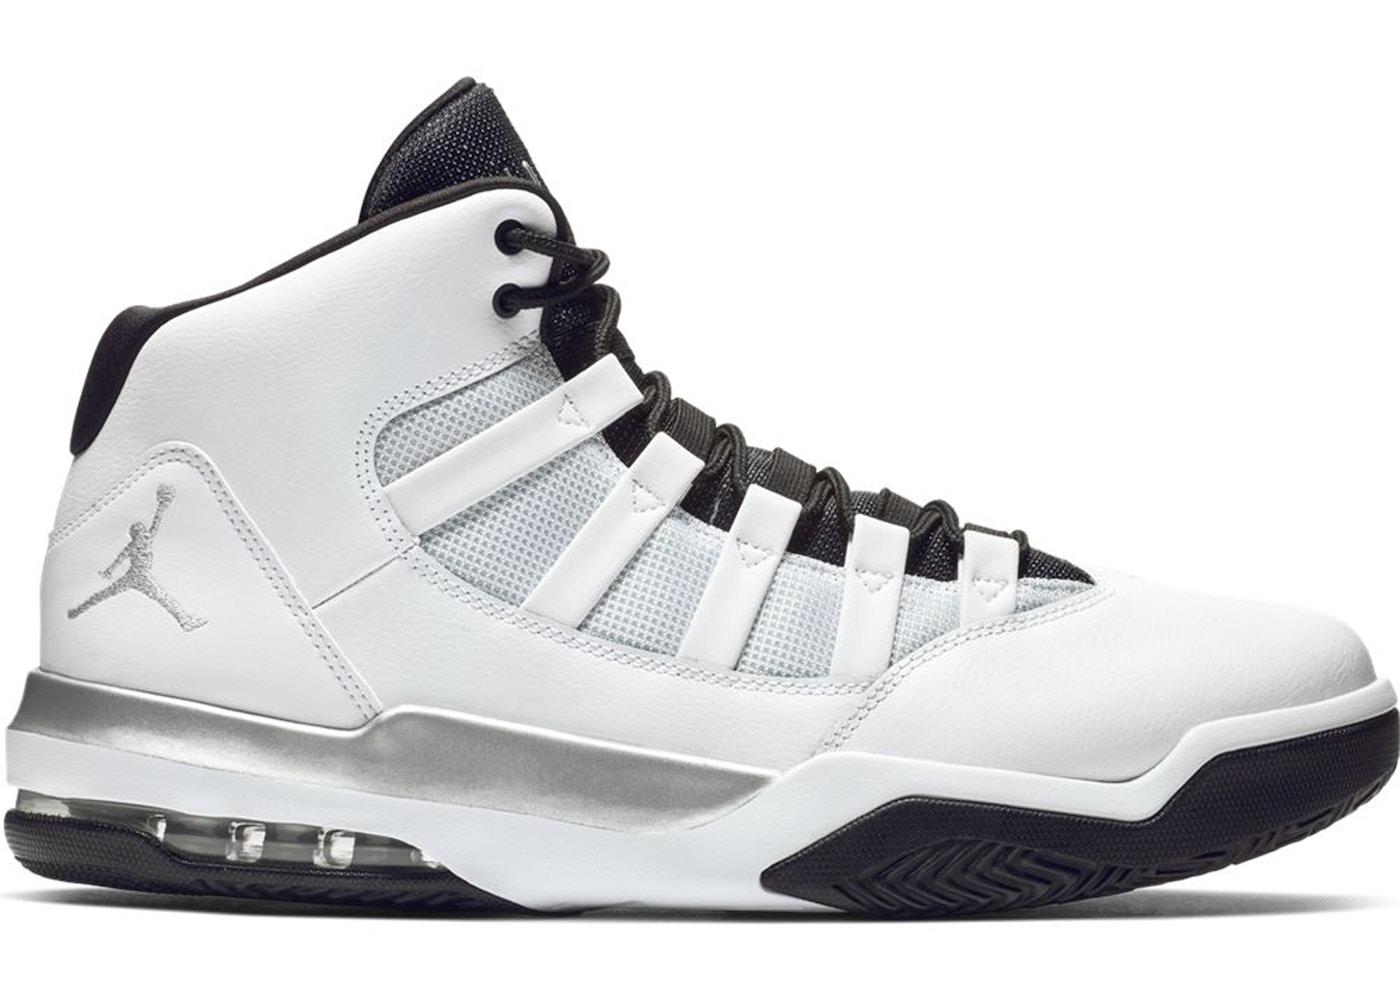 532ab3669d Sell. or Ask. Size: 12. View All Bids. Jordan Max Aura White Metallic  Silver Black